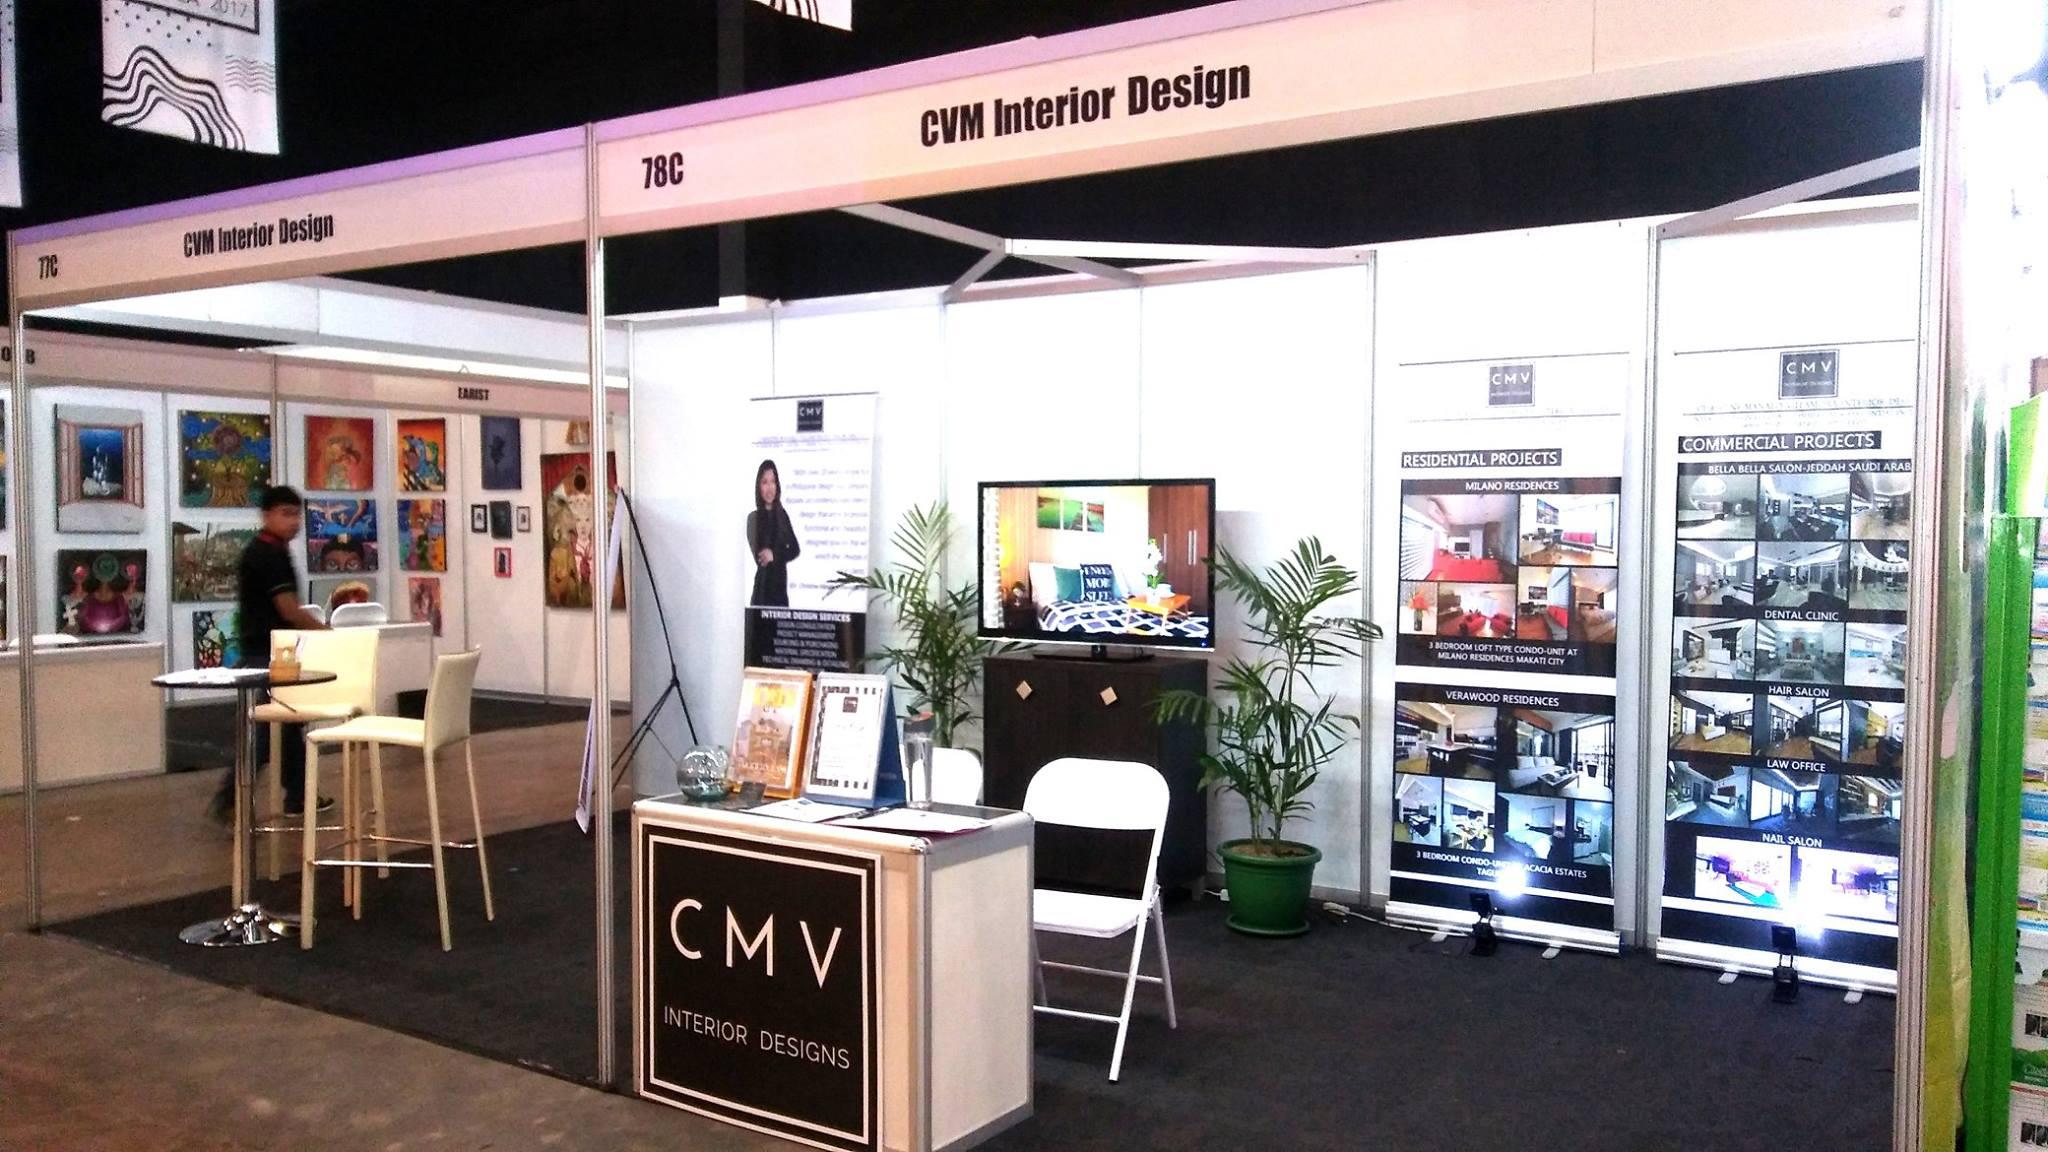 CONTACT CMV INTERIOR DESIGNS